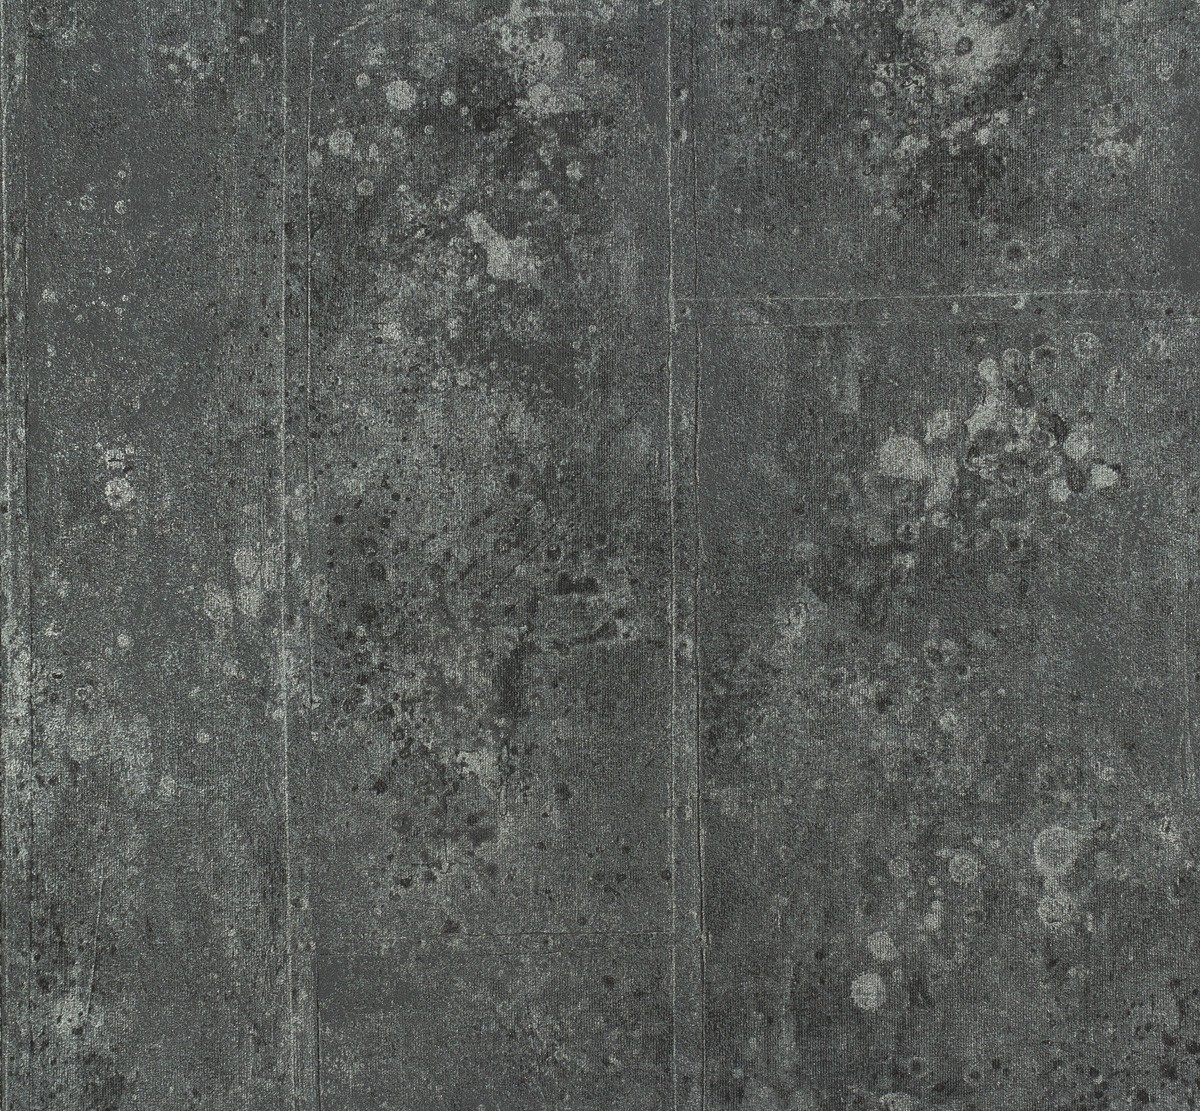 p s origin 42100 30 tapete vlies beton optik schwarz silber metallic 2 81 1qm ebay. Black Bedroom Furniture Sets. Home Design Ideas